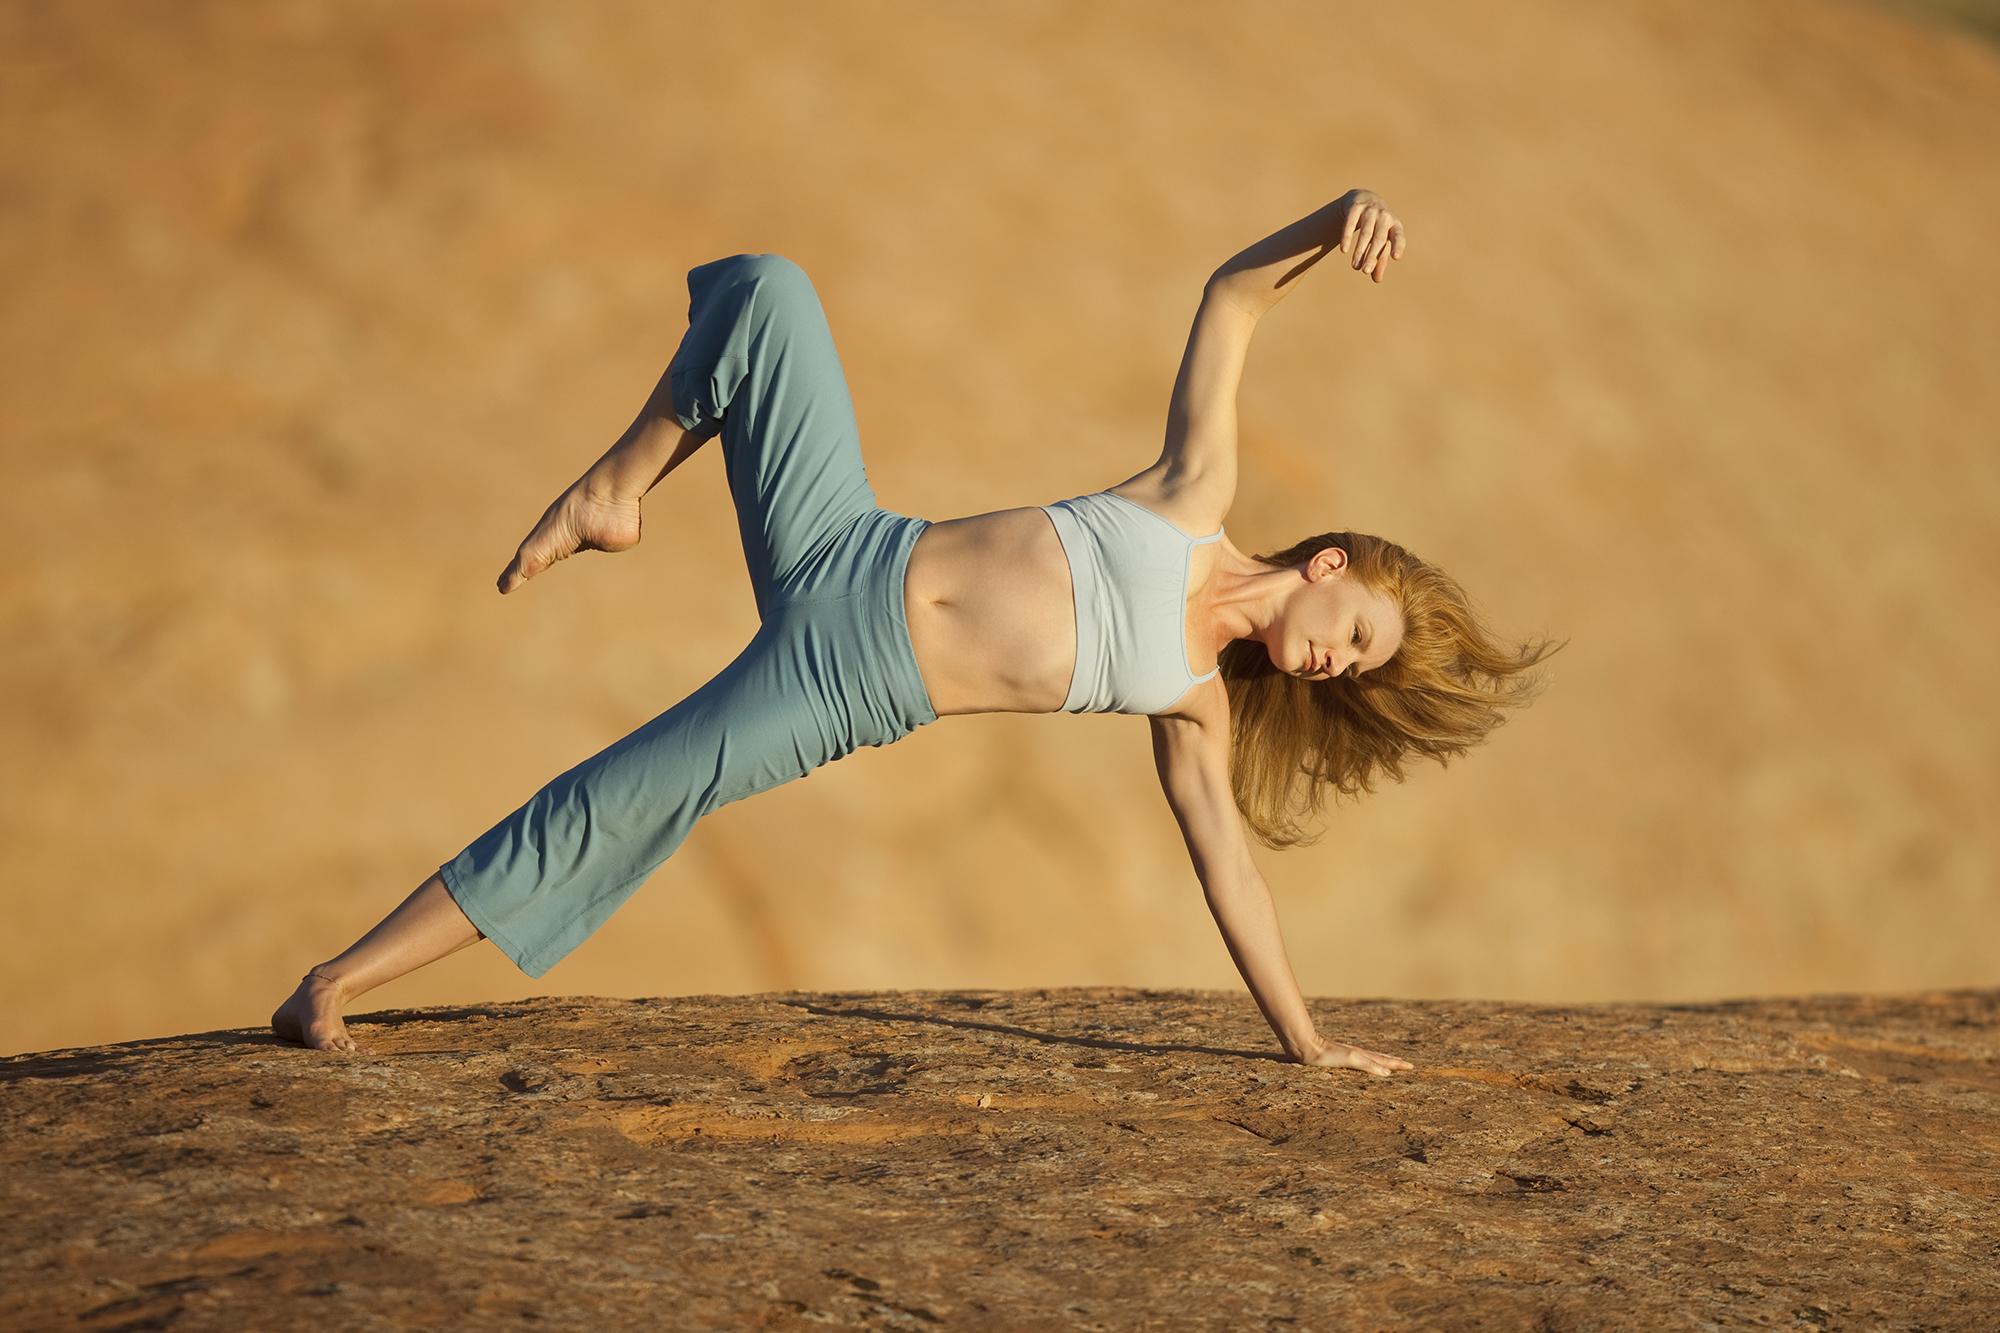 Yoga Instructor Environmental Portrait